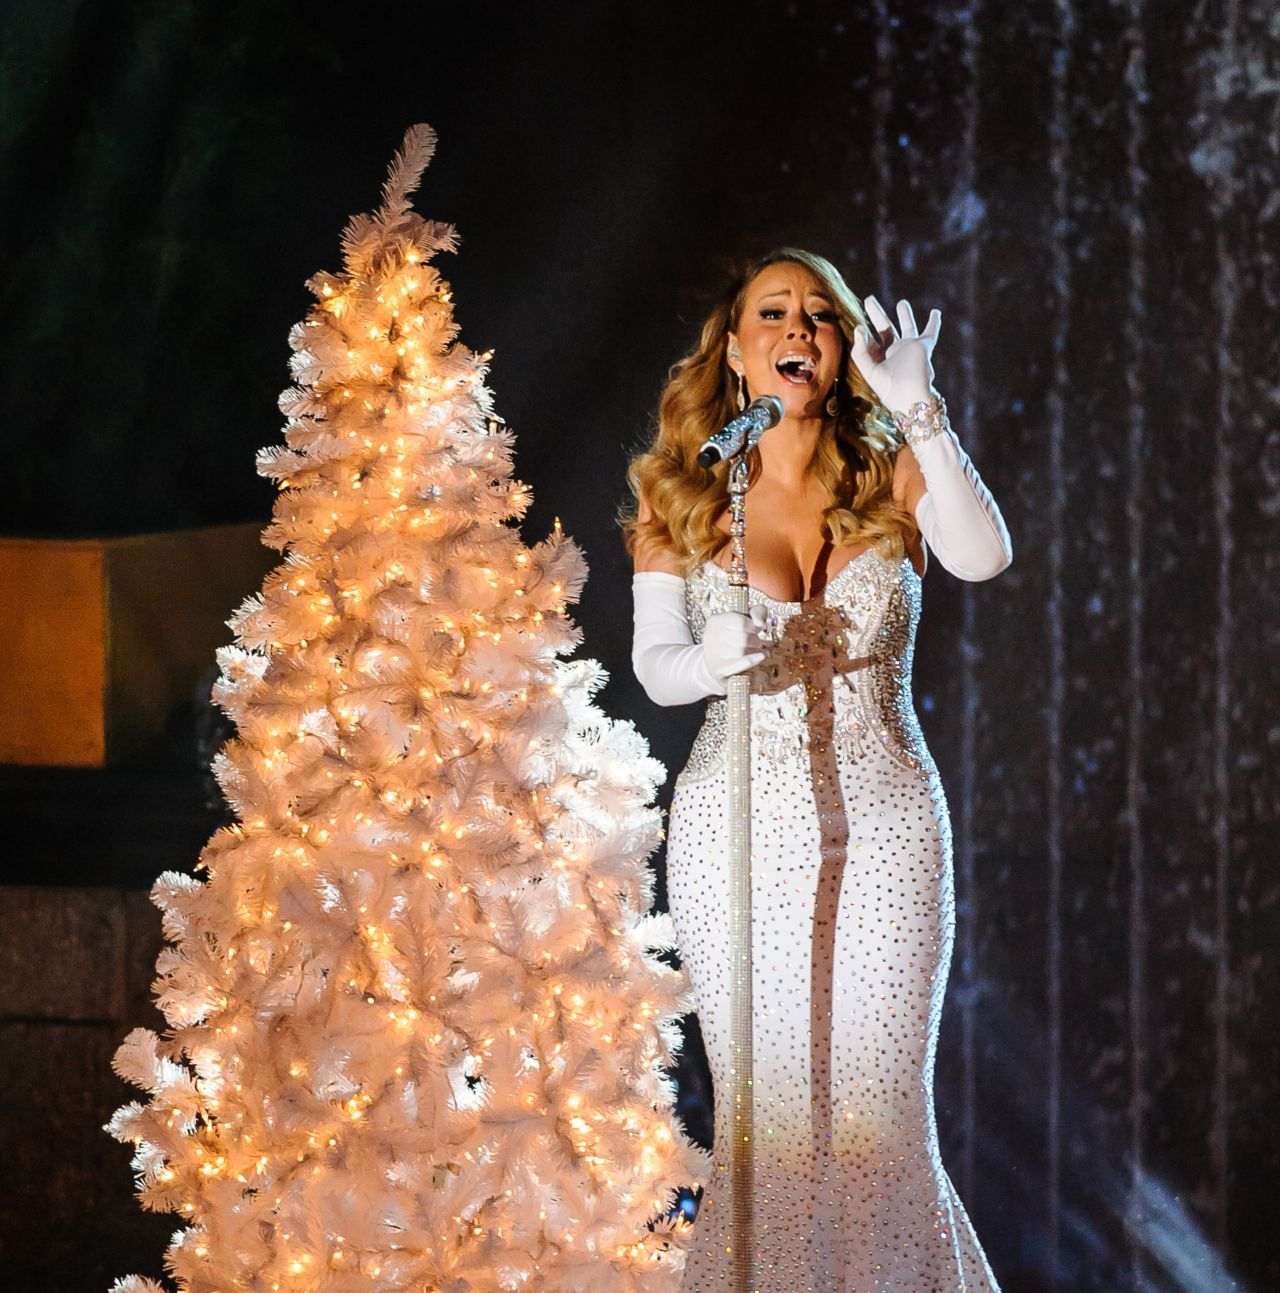 Rockefeller Center Christmas Tree 2013: Mariah Carey Performs At 81st Annual Rockefeller Center